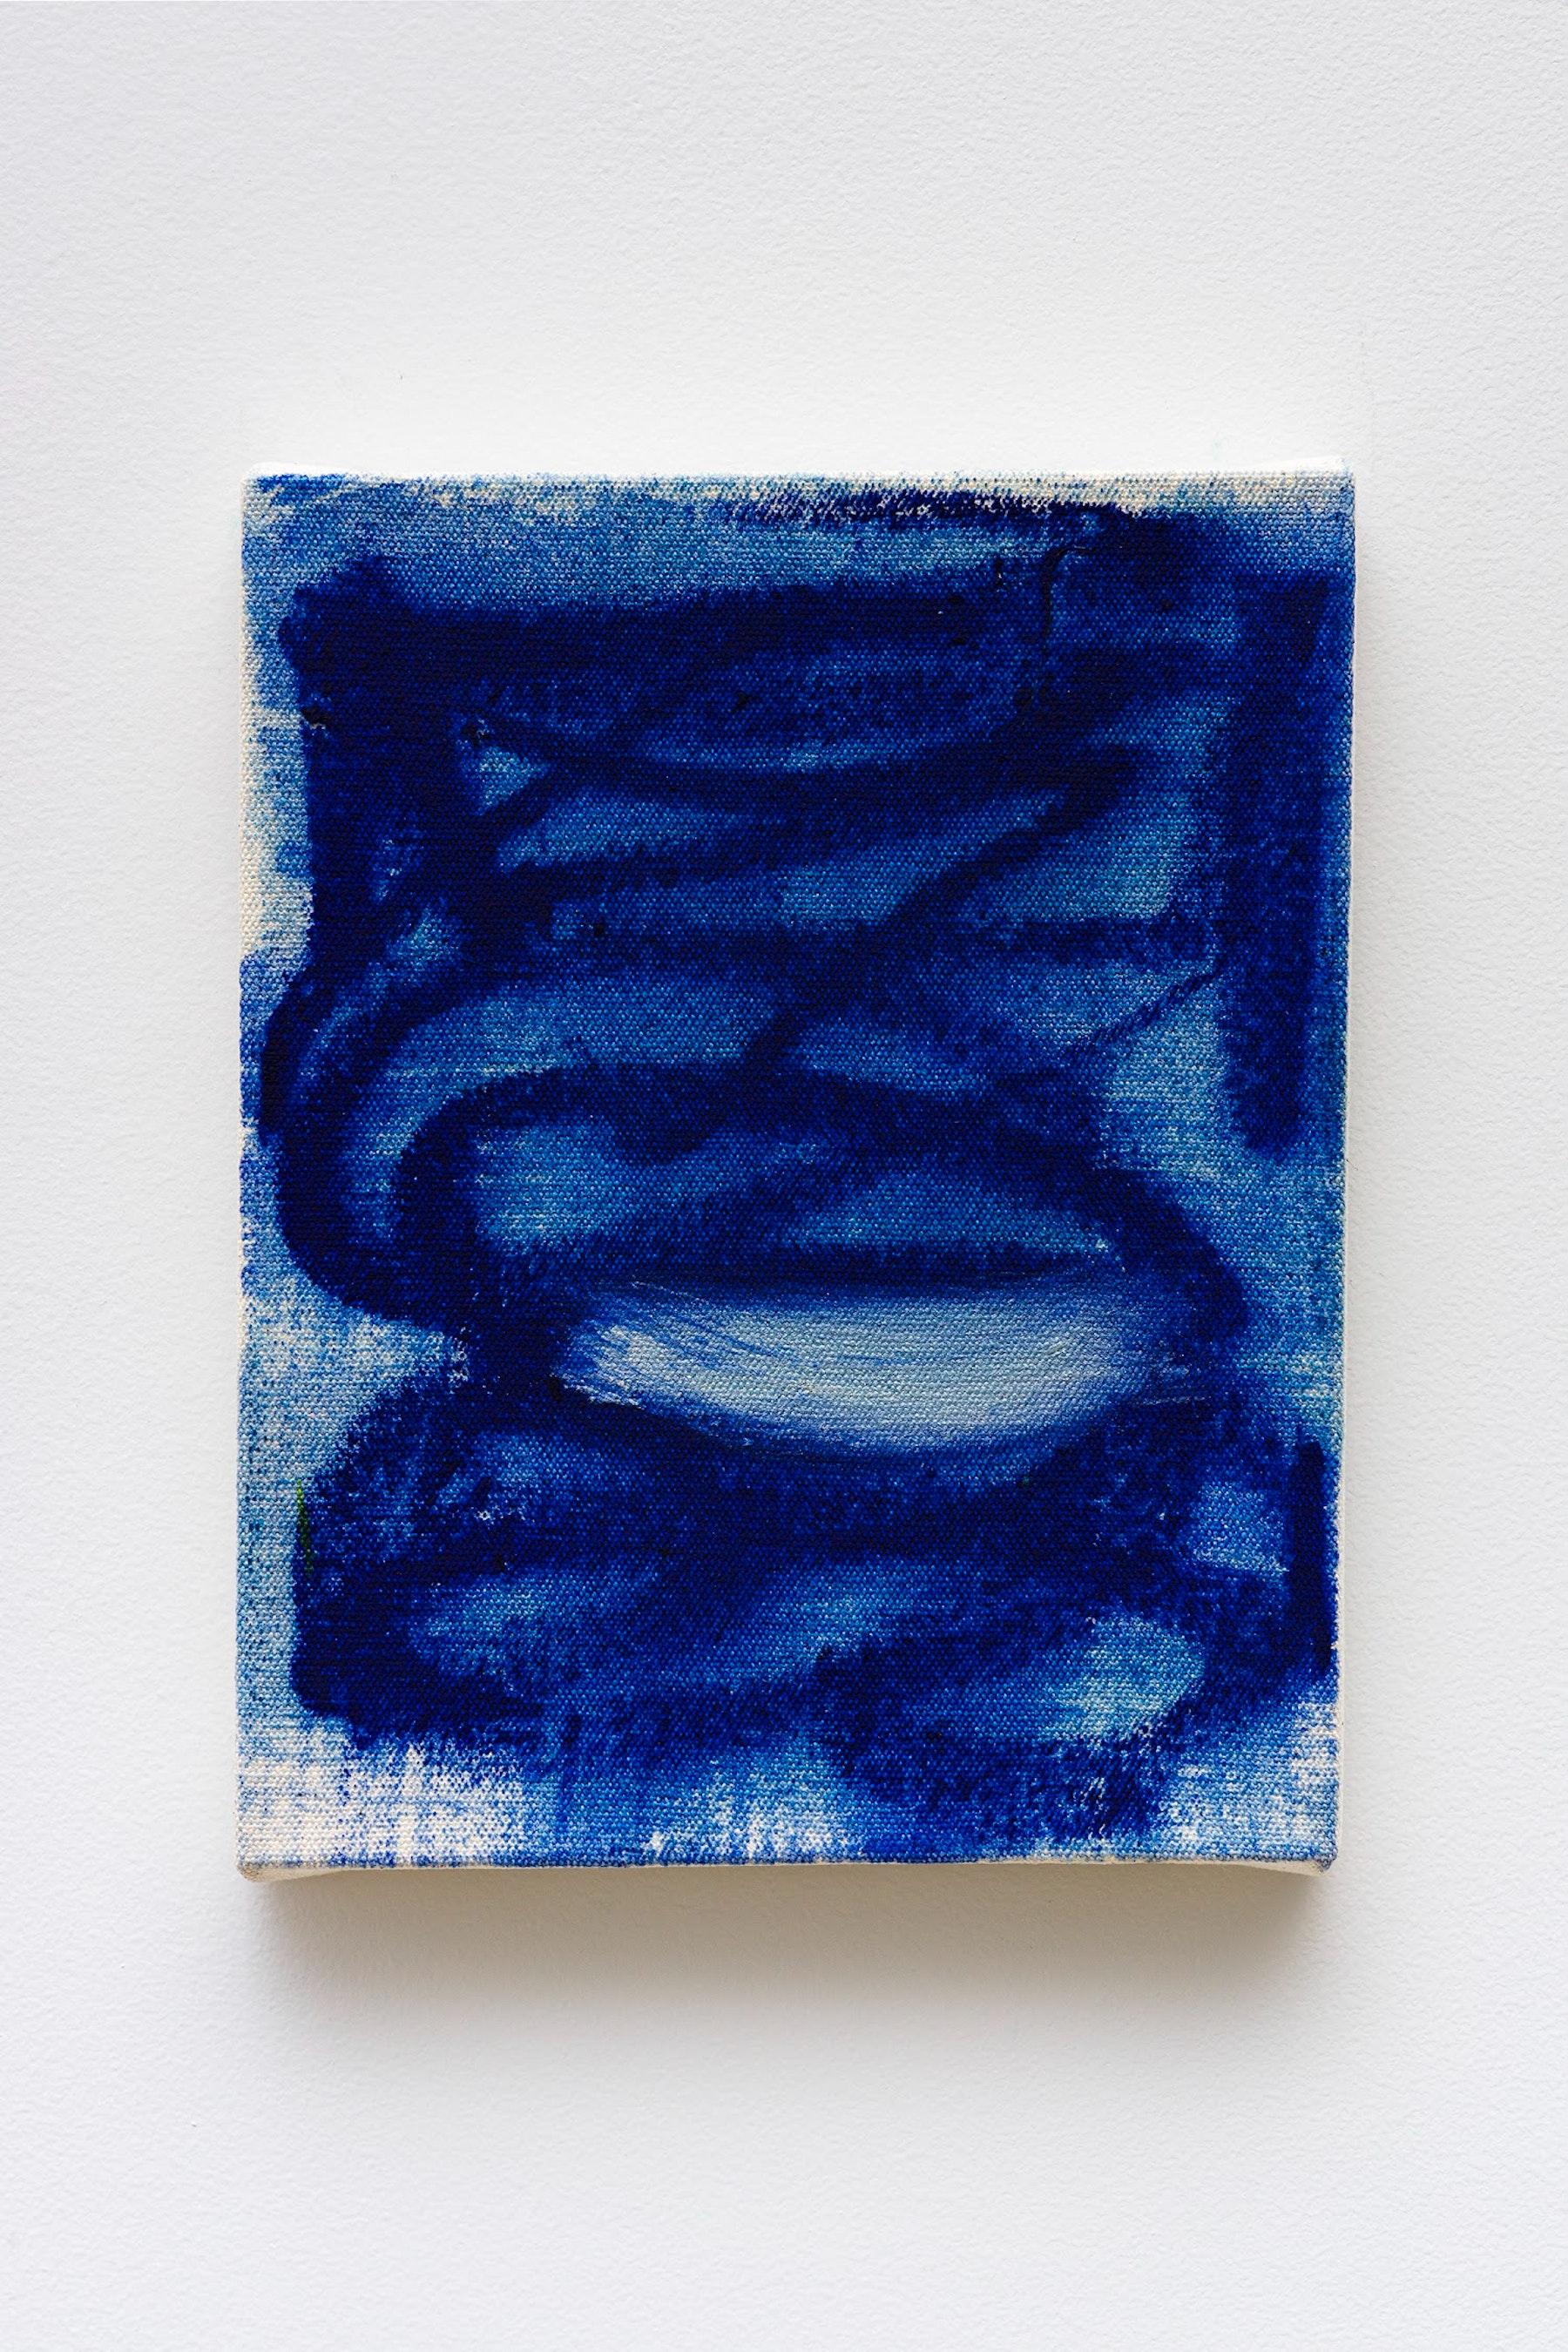 "Monique Van Genderen ""Untitled,"" 2020 Oil on canvas 10 x 8"" [HxW] (25.4 x 20.32 cm) Inventory #VGE404 Courtesy of the artist and Vielmetter Los Angeles Photo credit: Jeff Mclane"